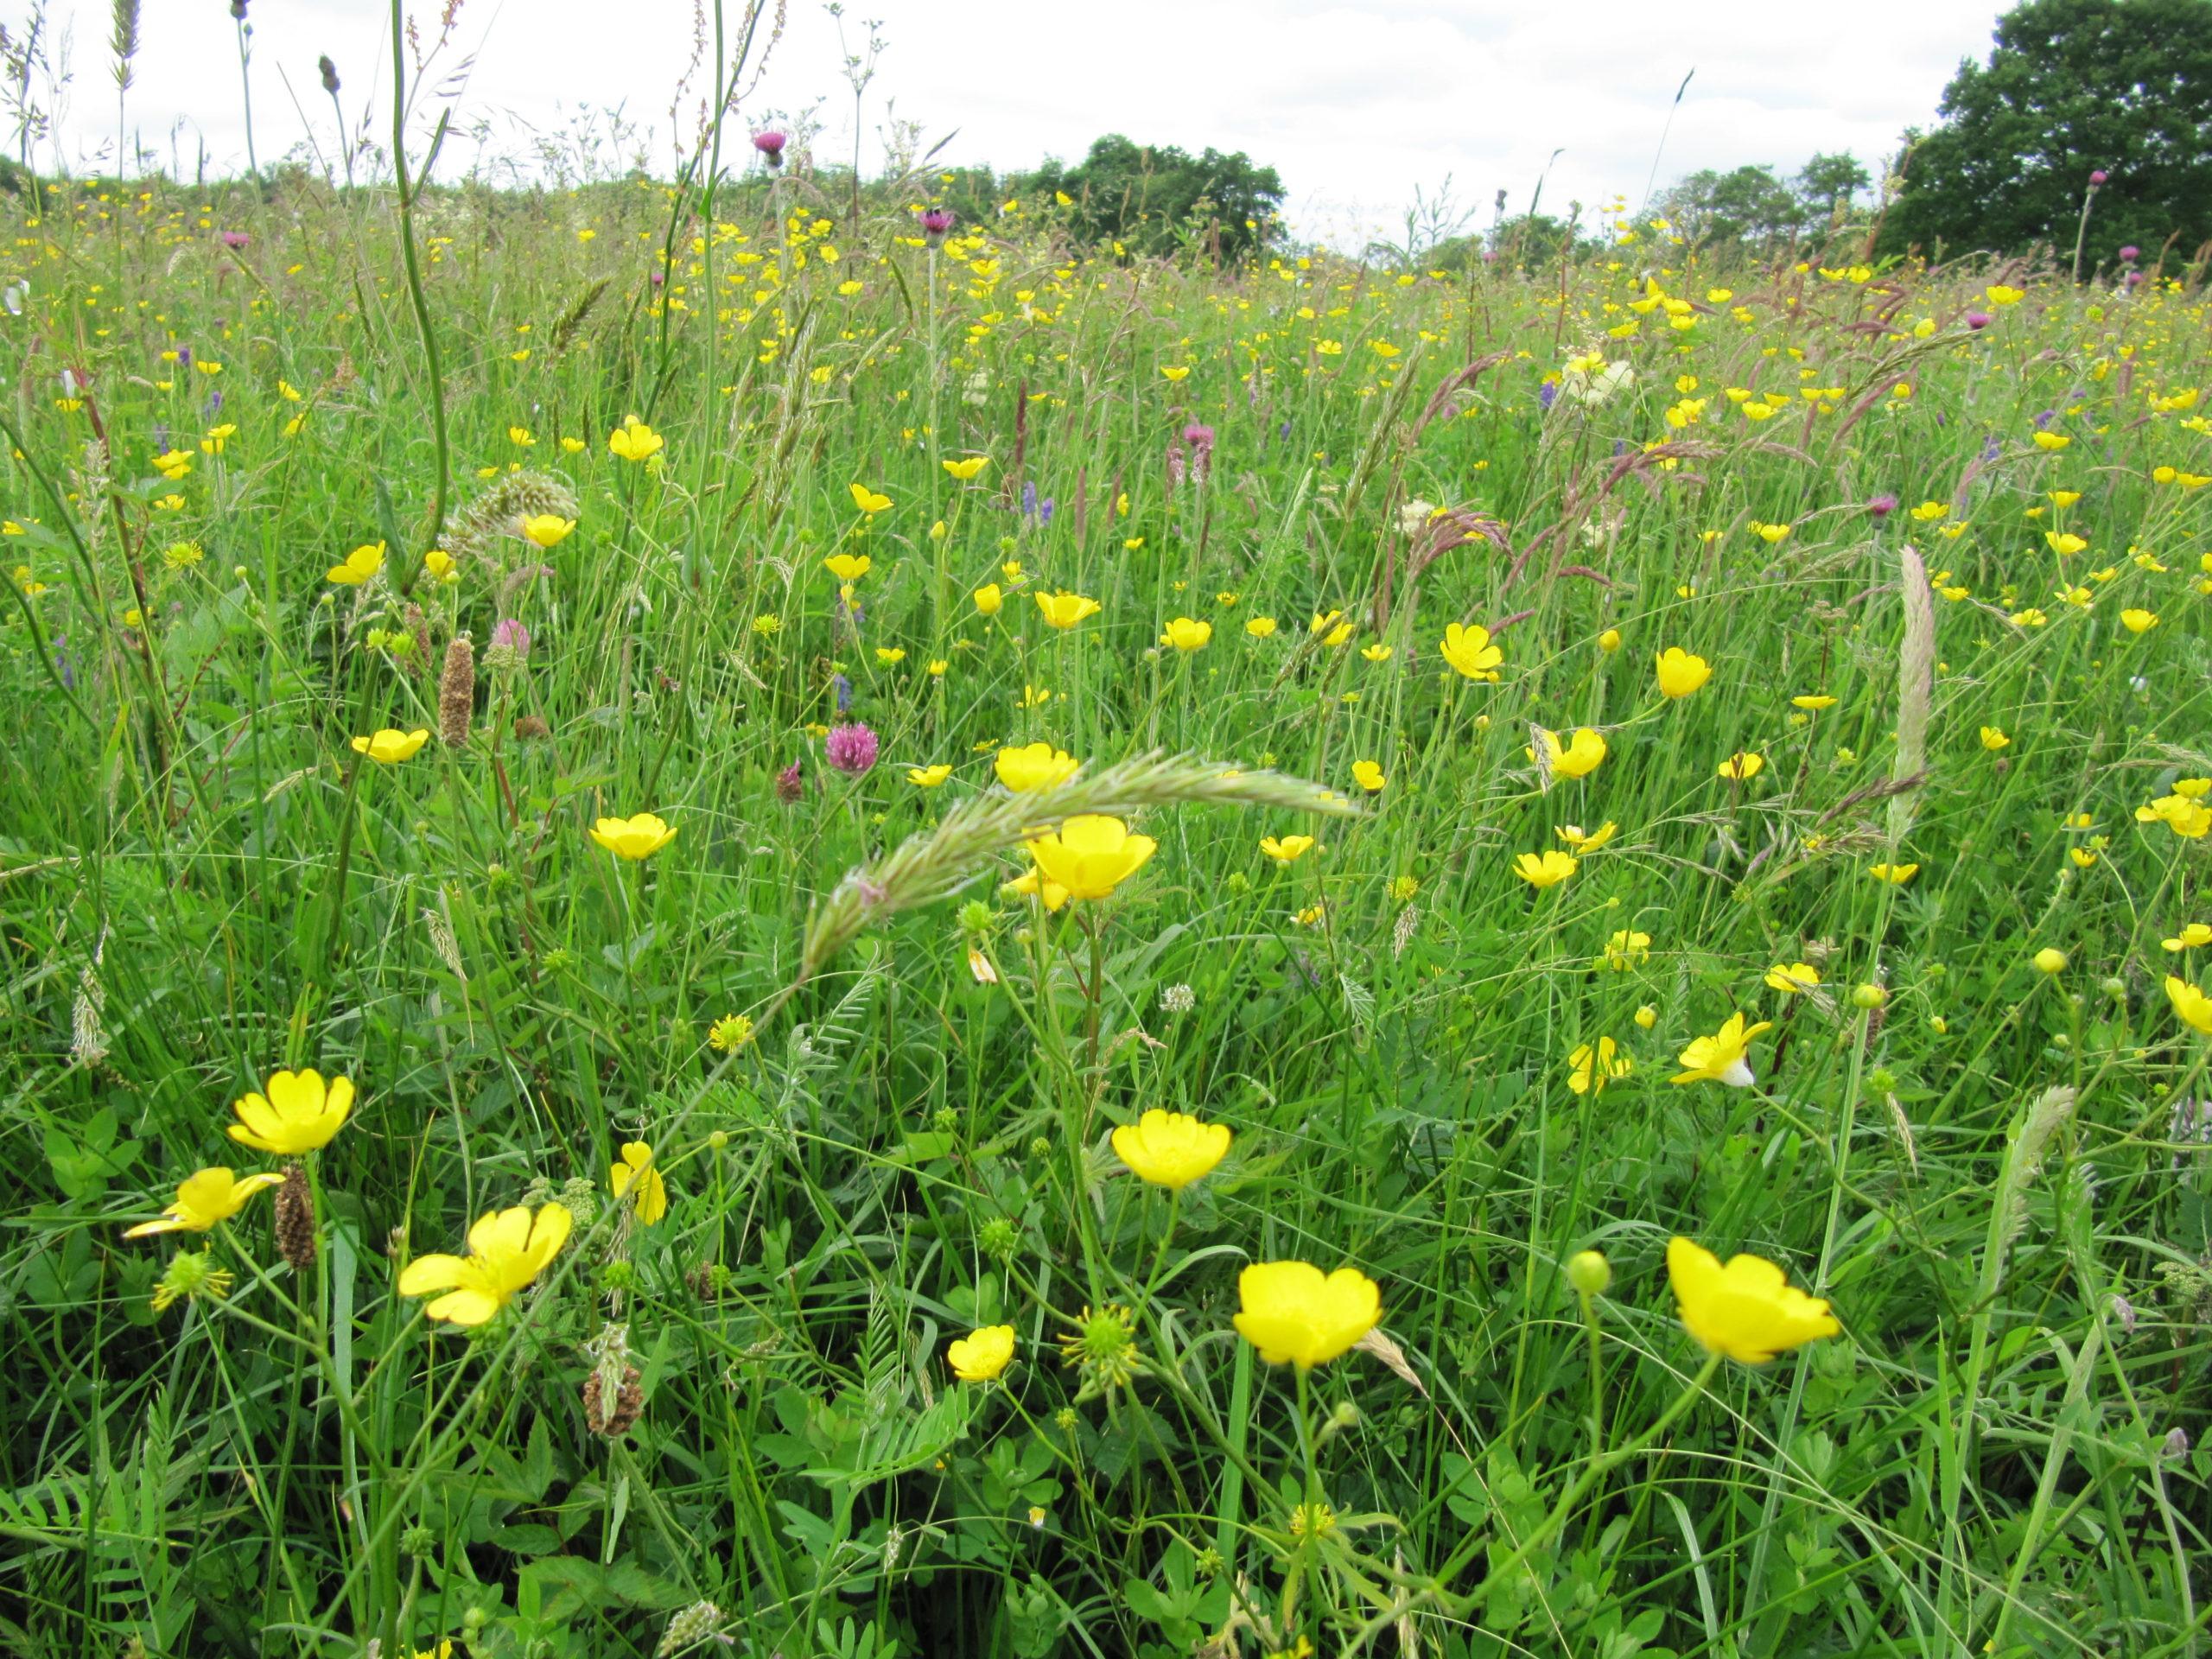 Grassland Overview by Fionnuala O'Neill ©NPWS